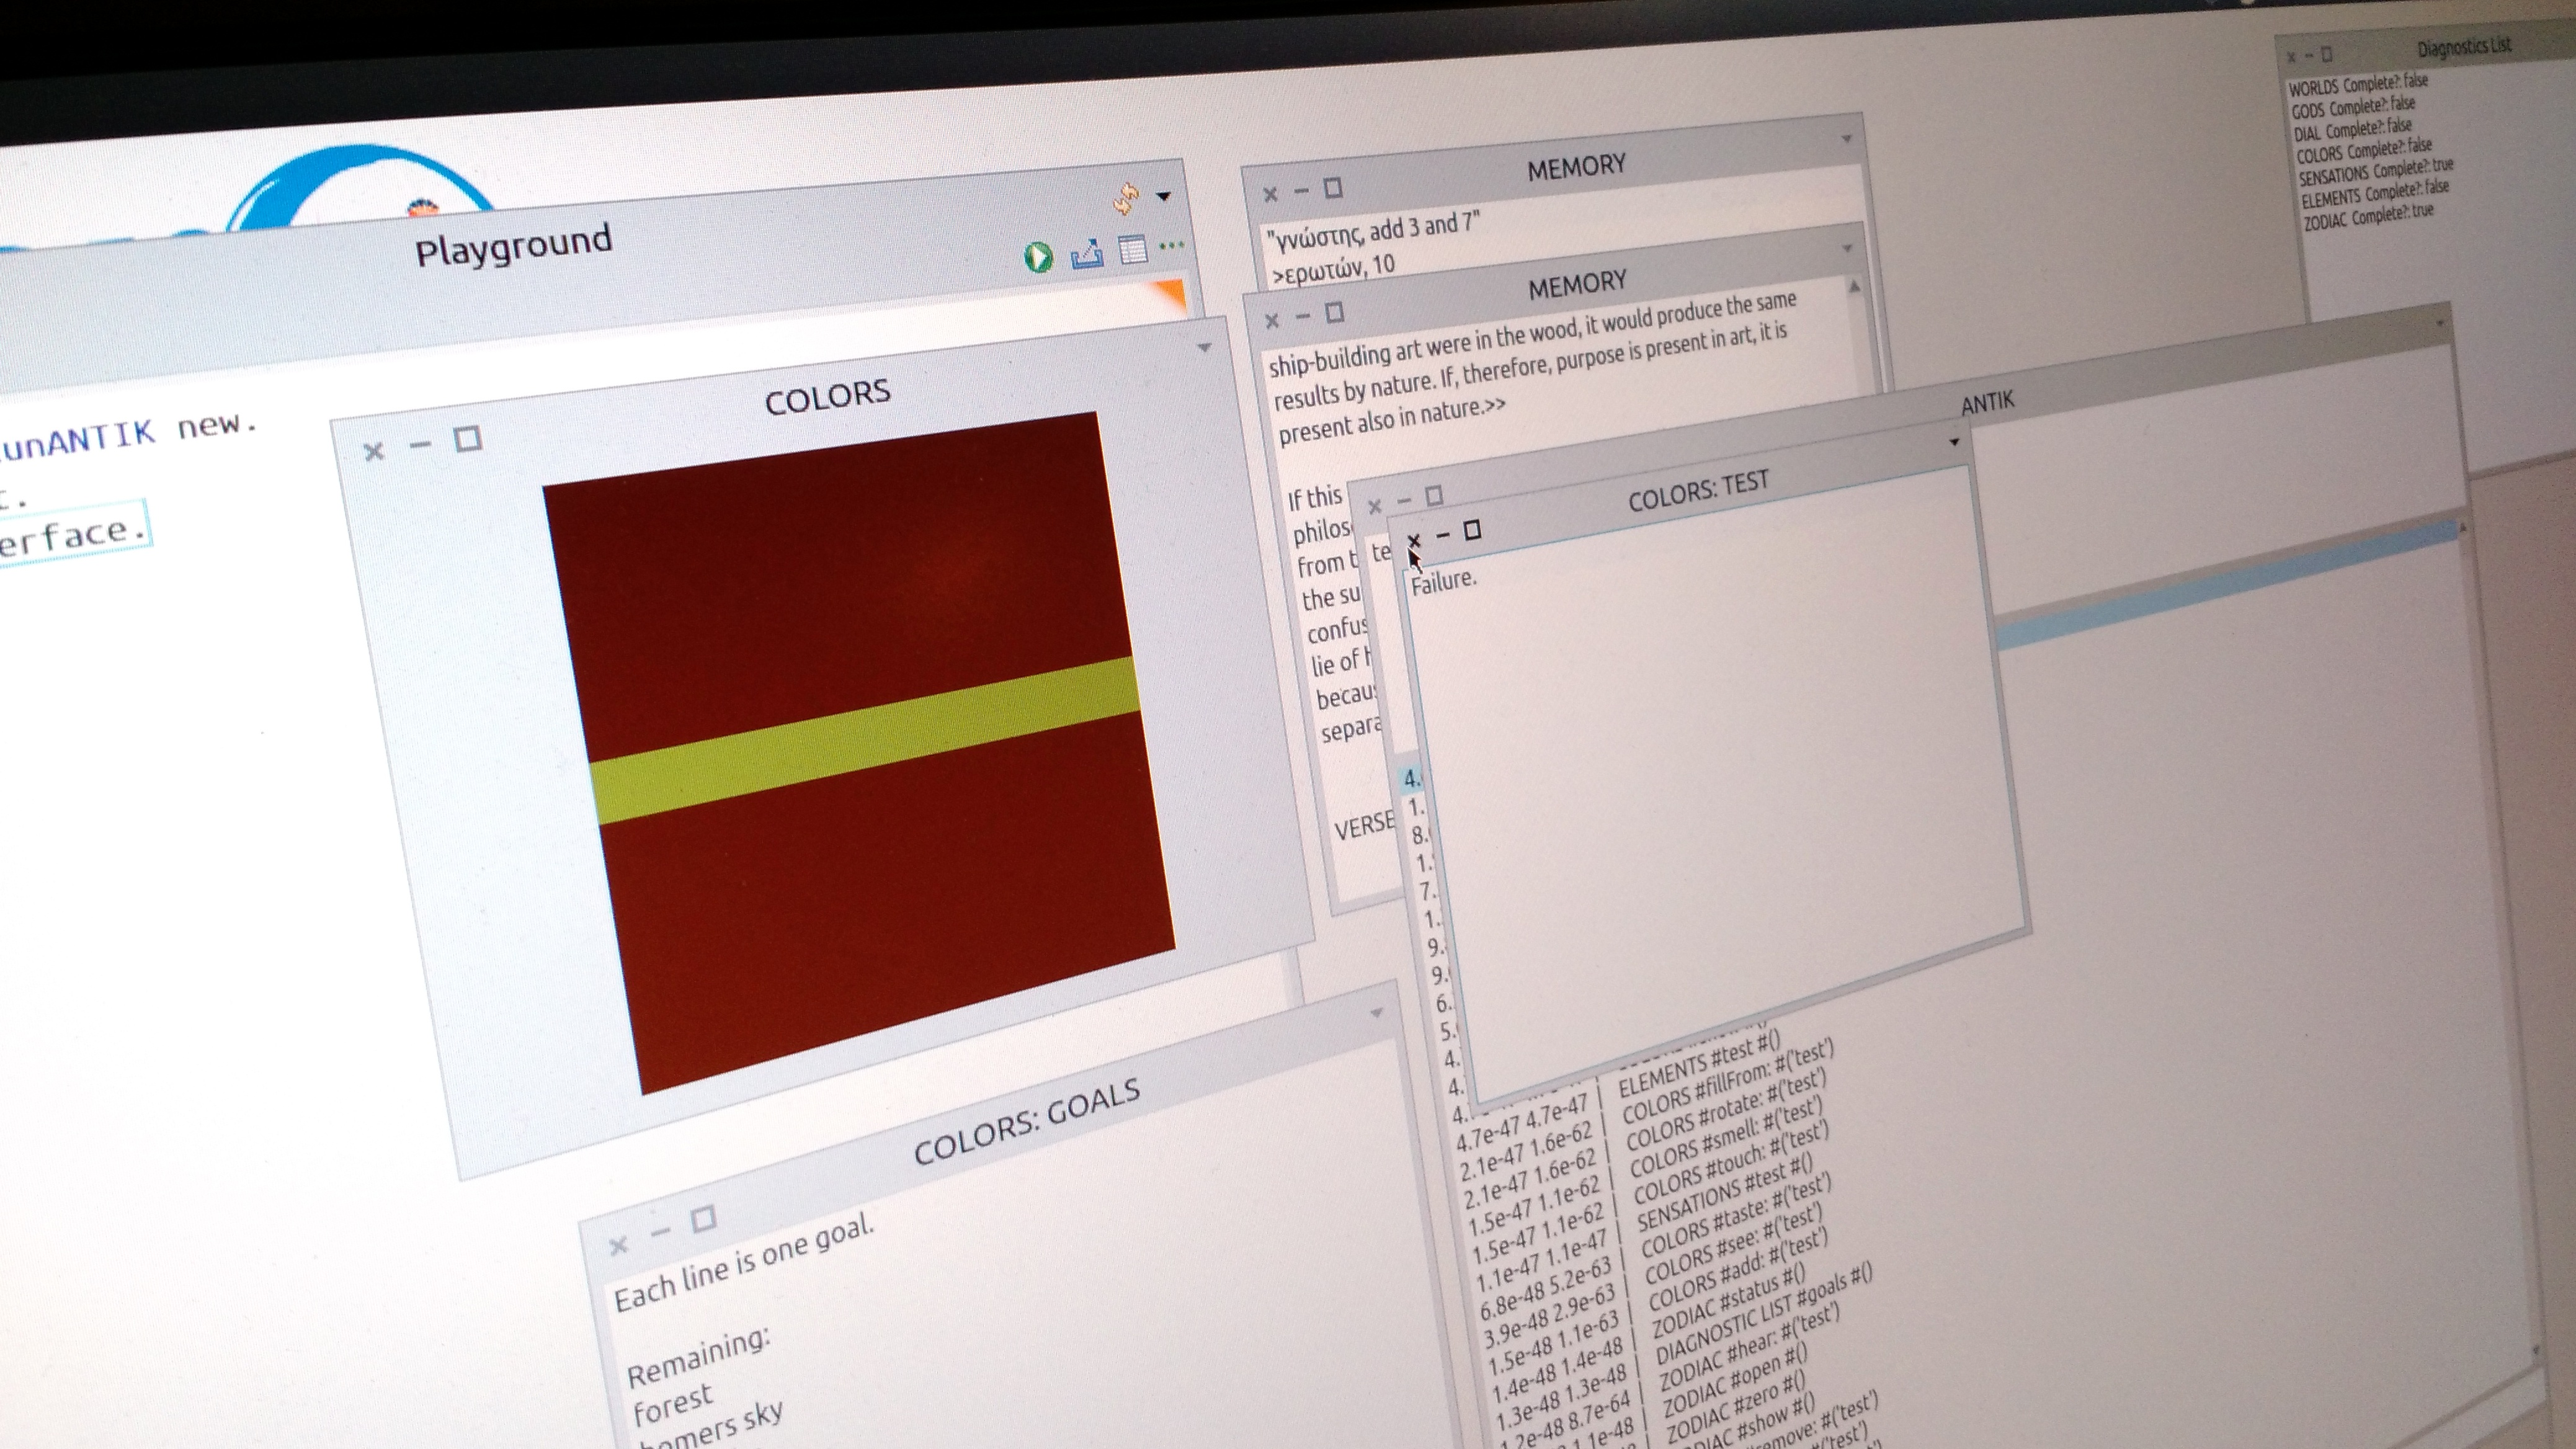 Antikythrea | MIT Game Lab